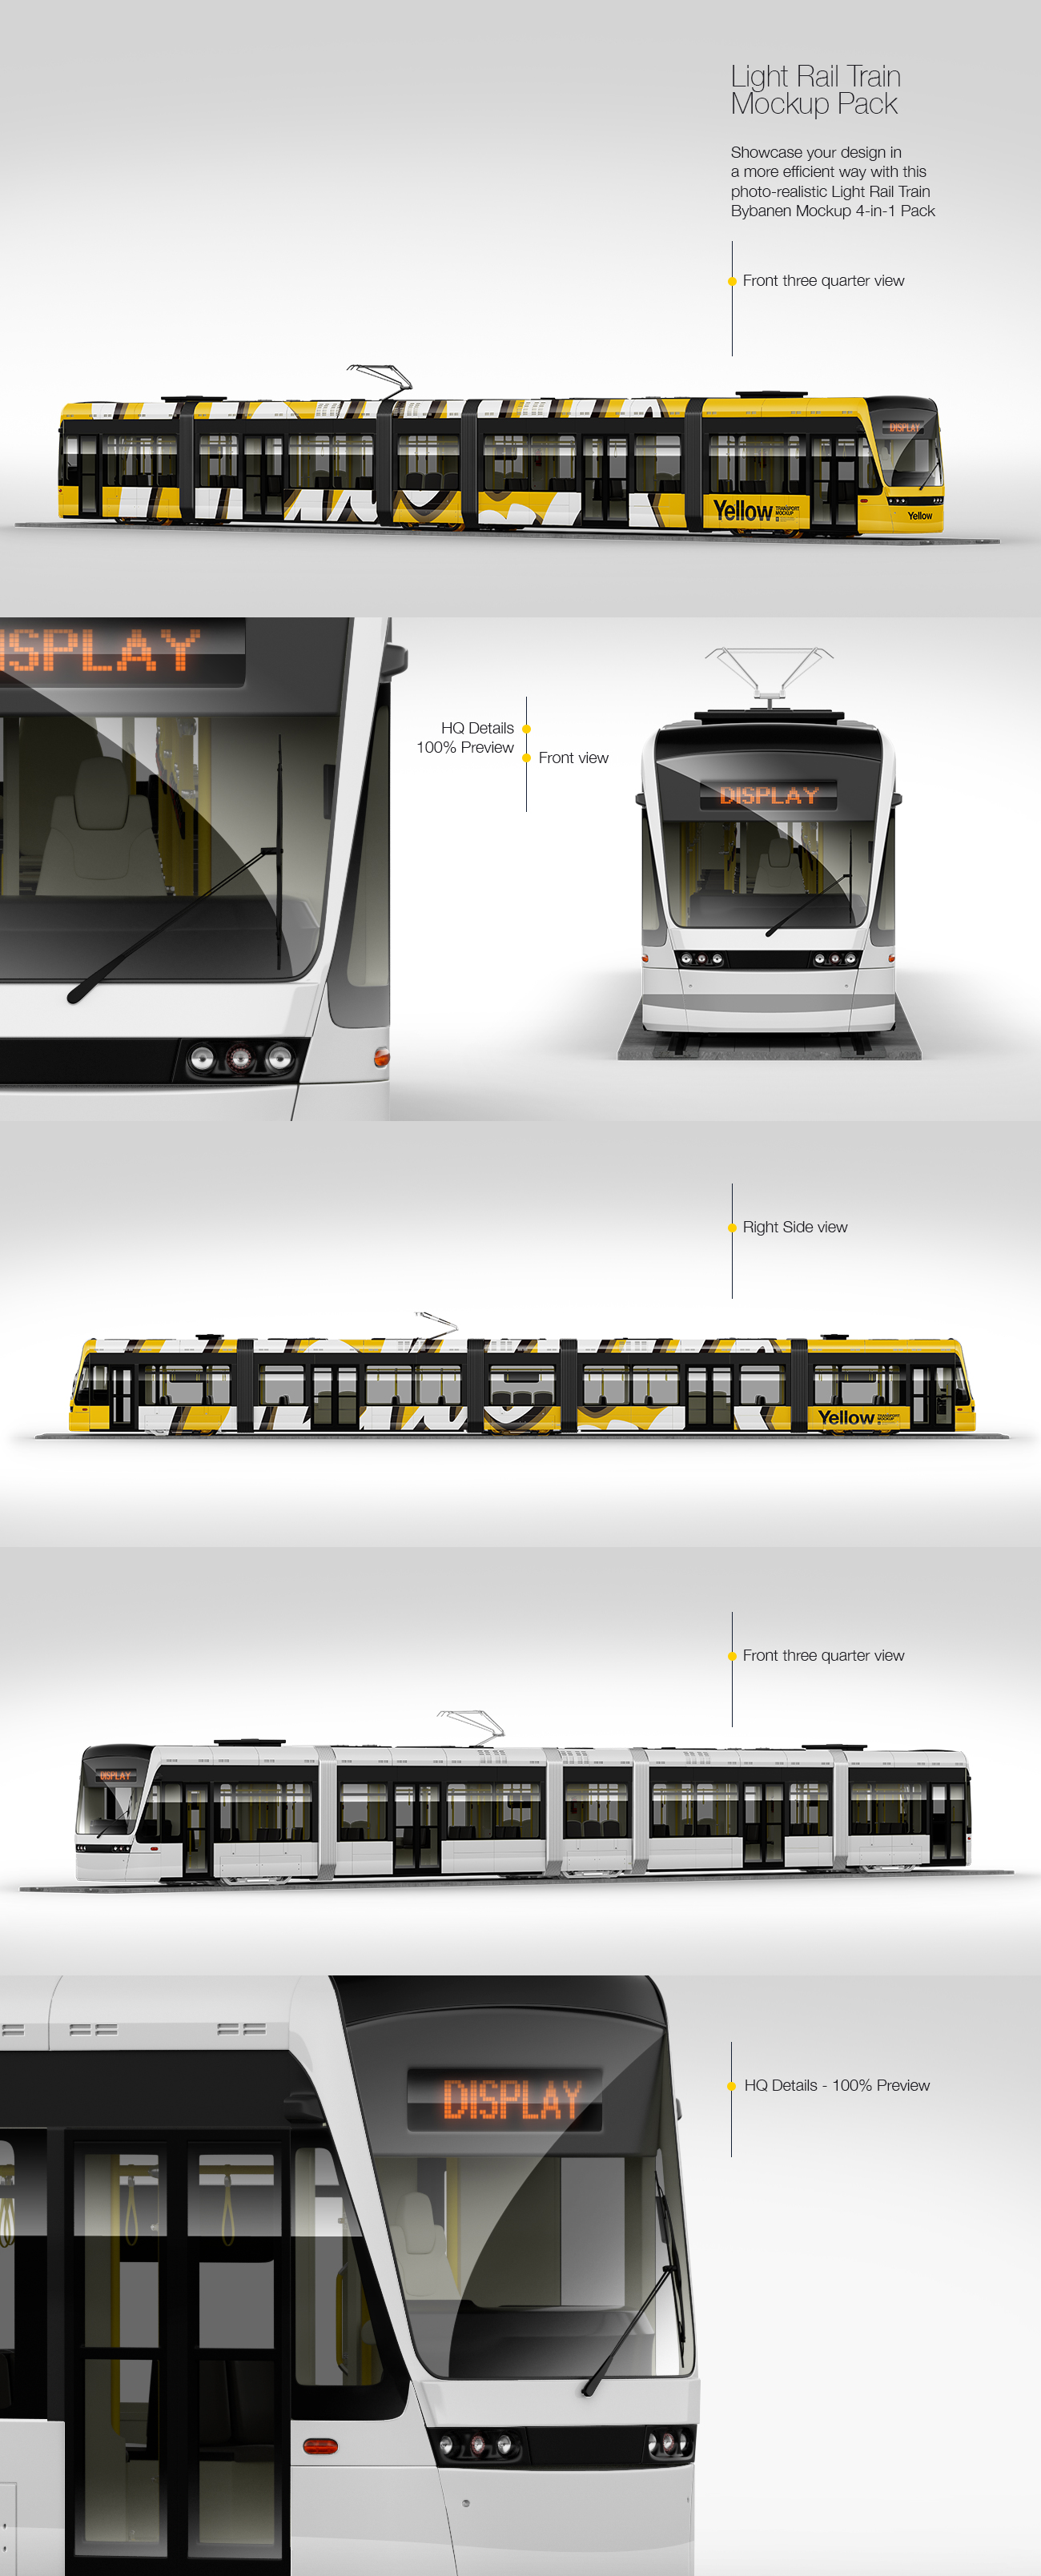 Light Rail Train Mockup Pack